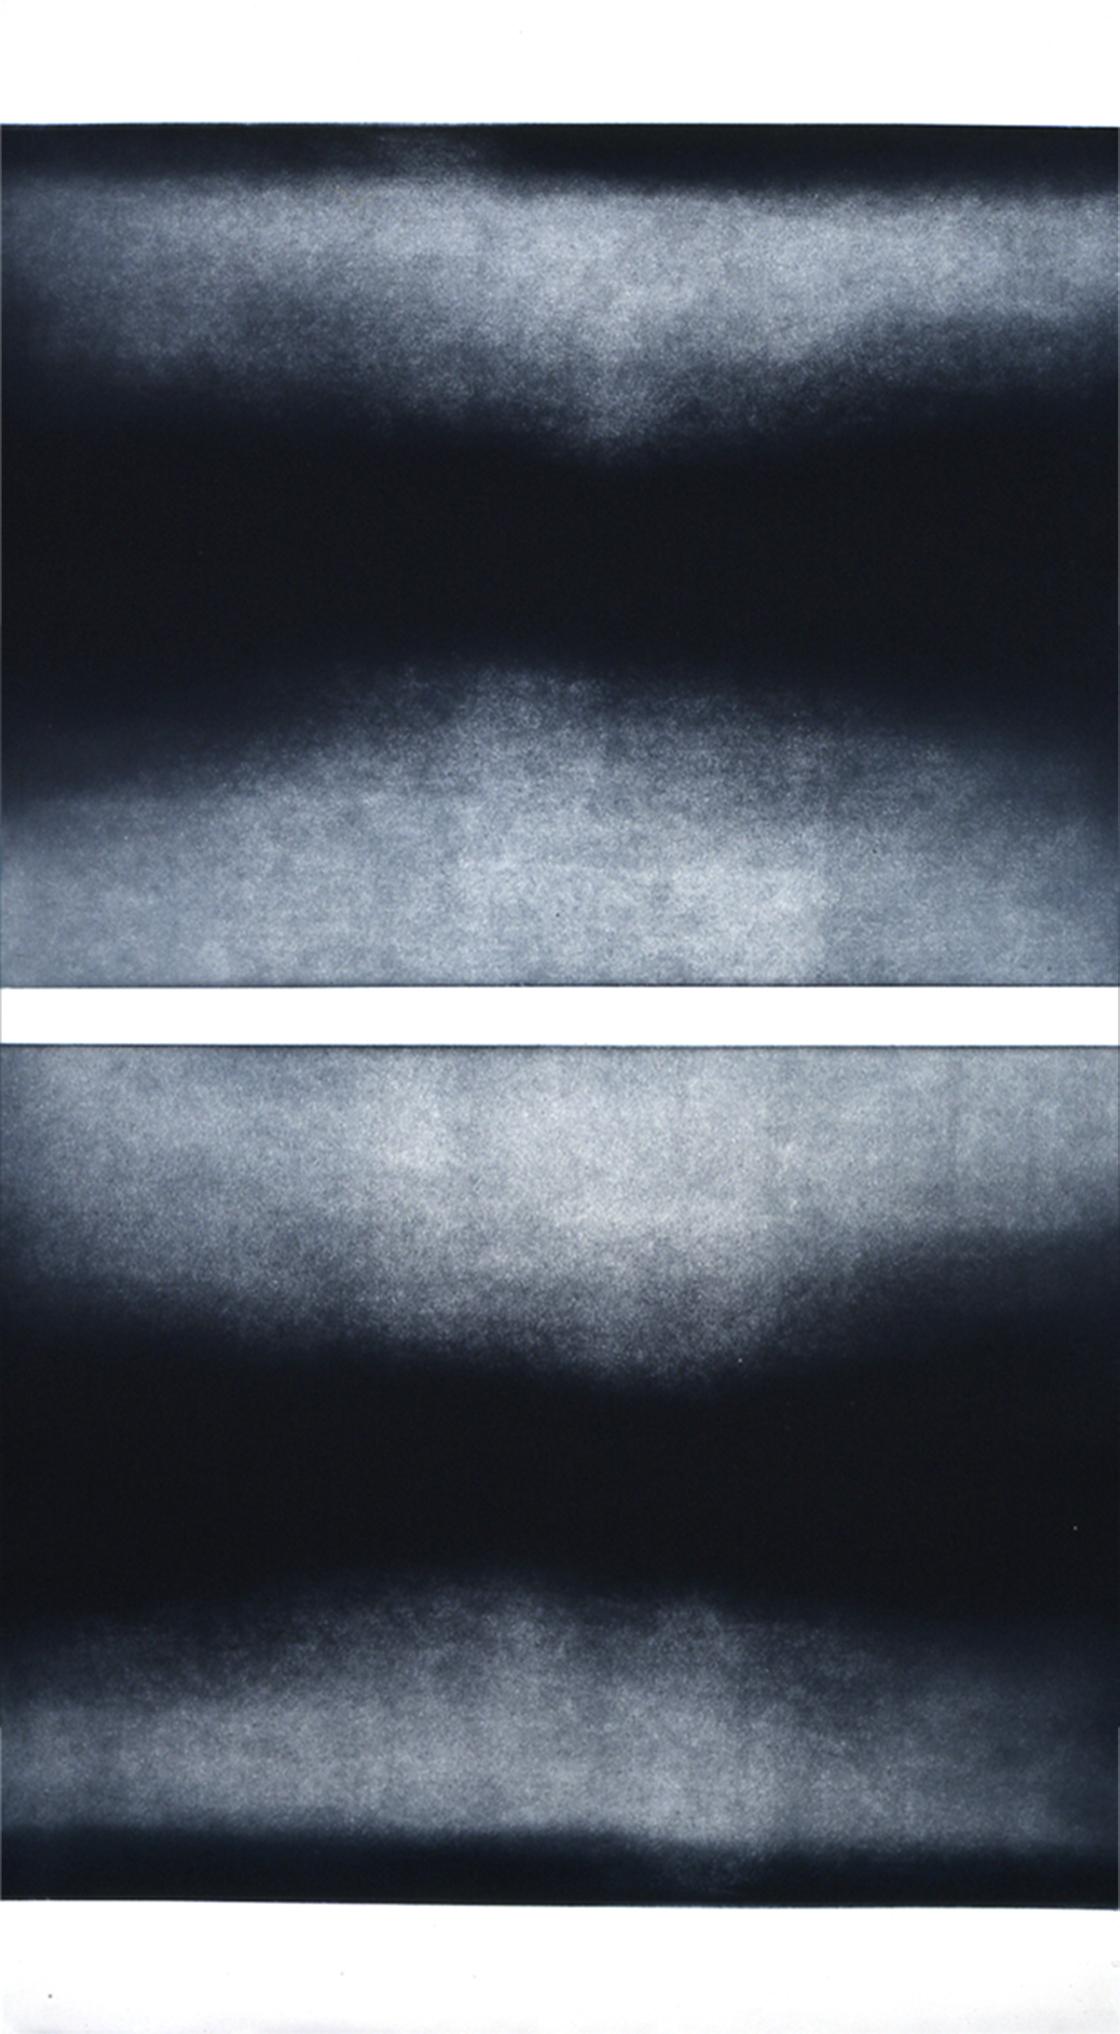 "Midnight Highway Color aquatint 24"" x 42"" 2005"